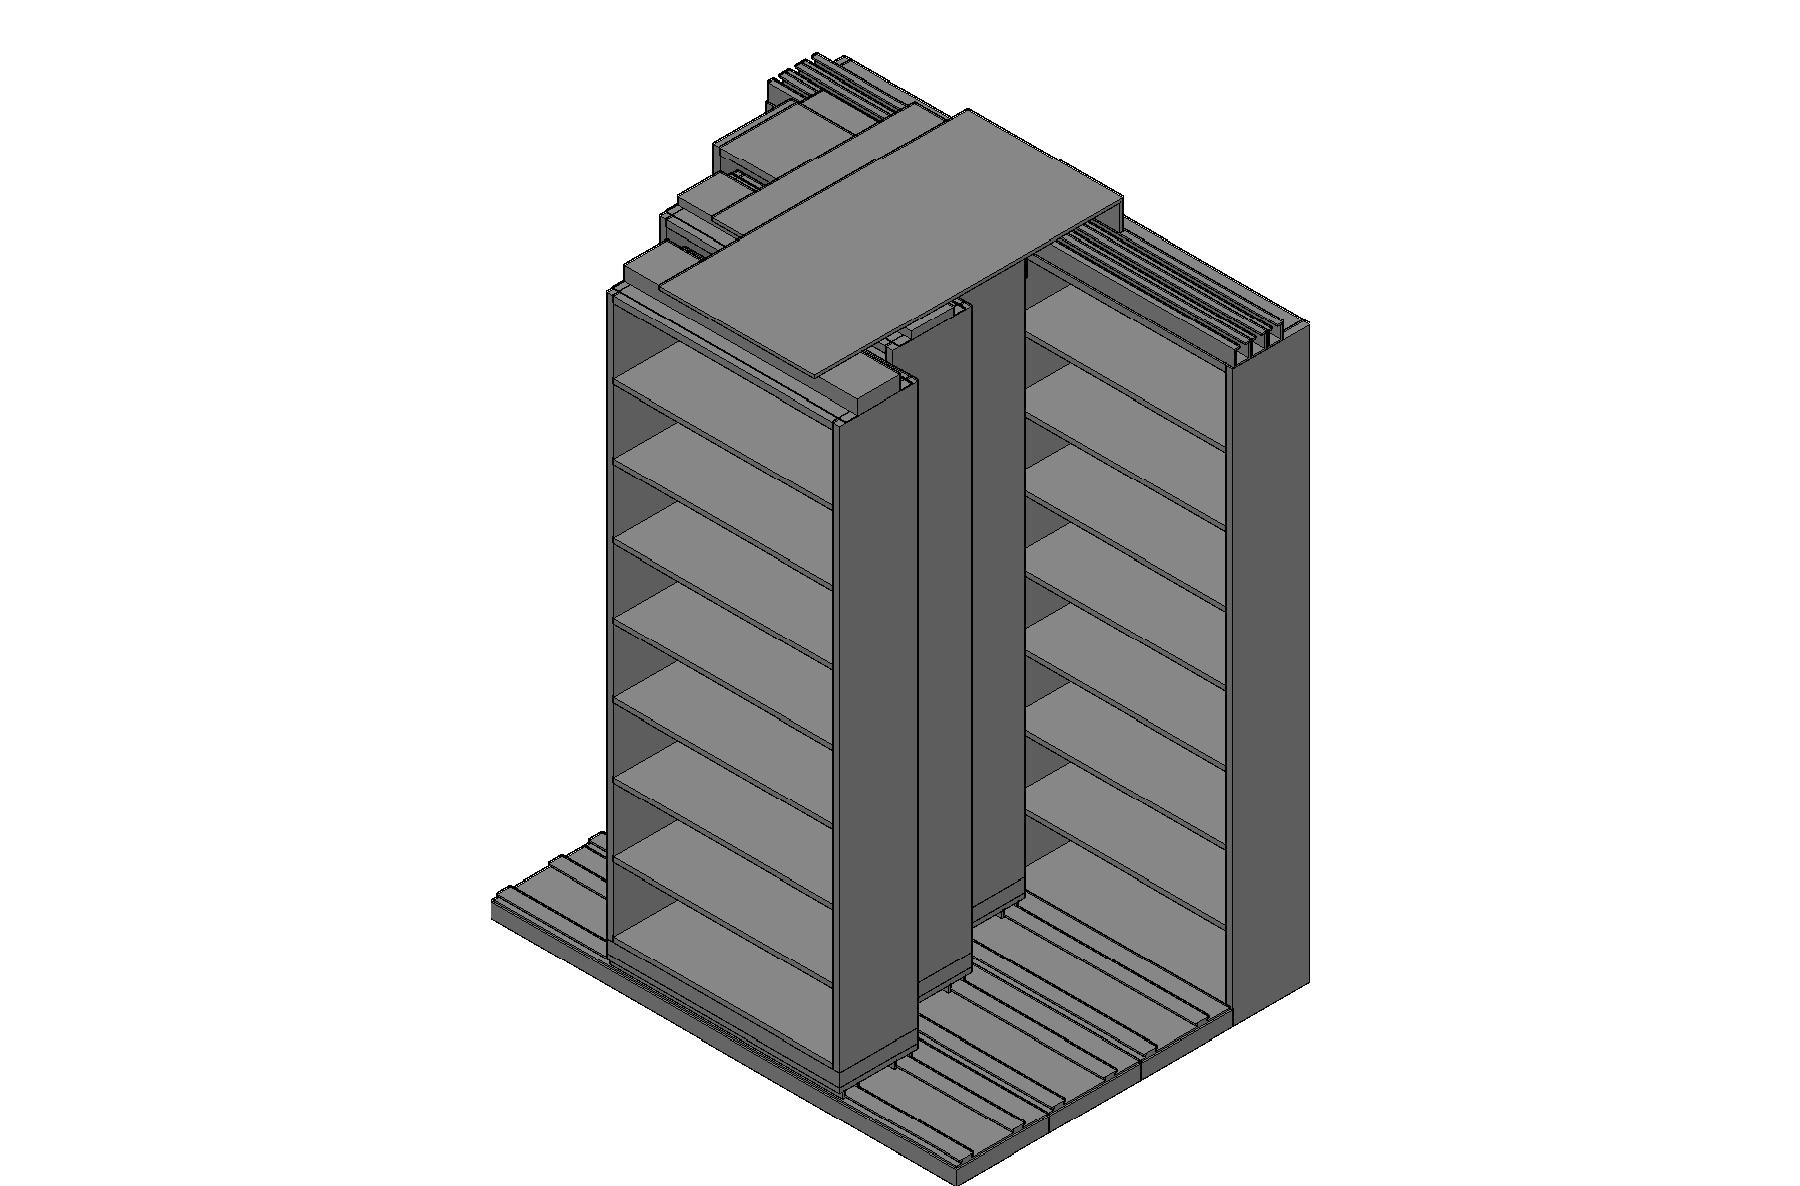 "Letter Size Sliding Shelves - 4 Rows Deep - 8 Levels - (36"" x 12"" Shelves) - 76"" Total Width"